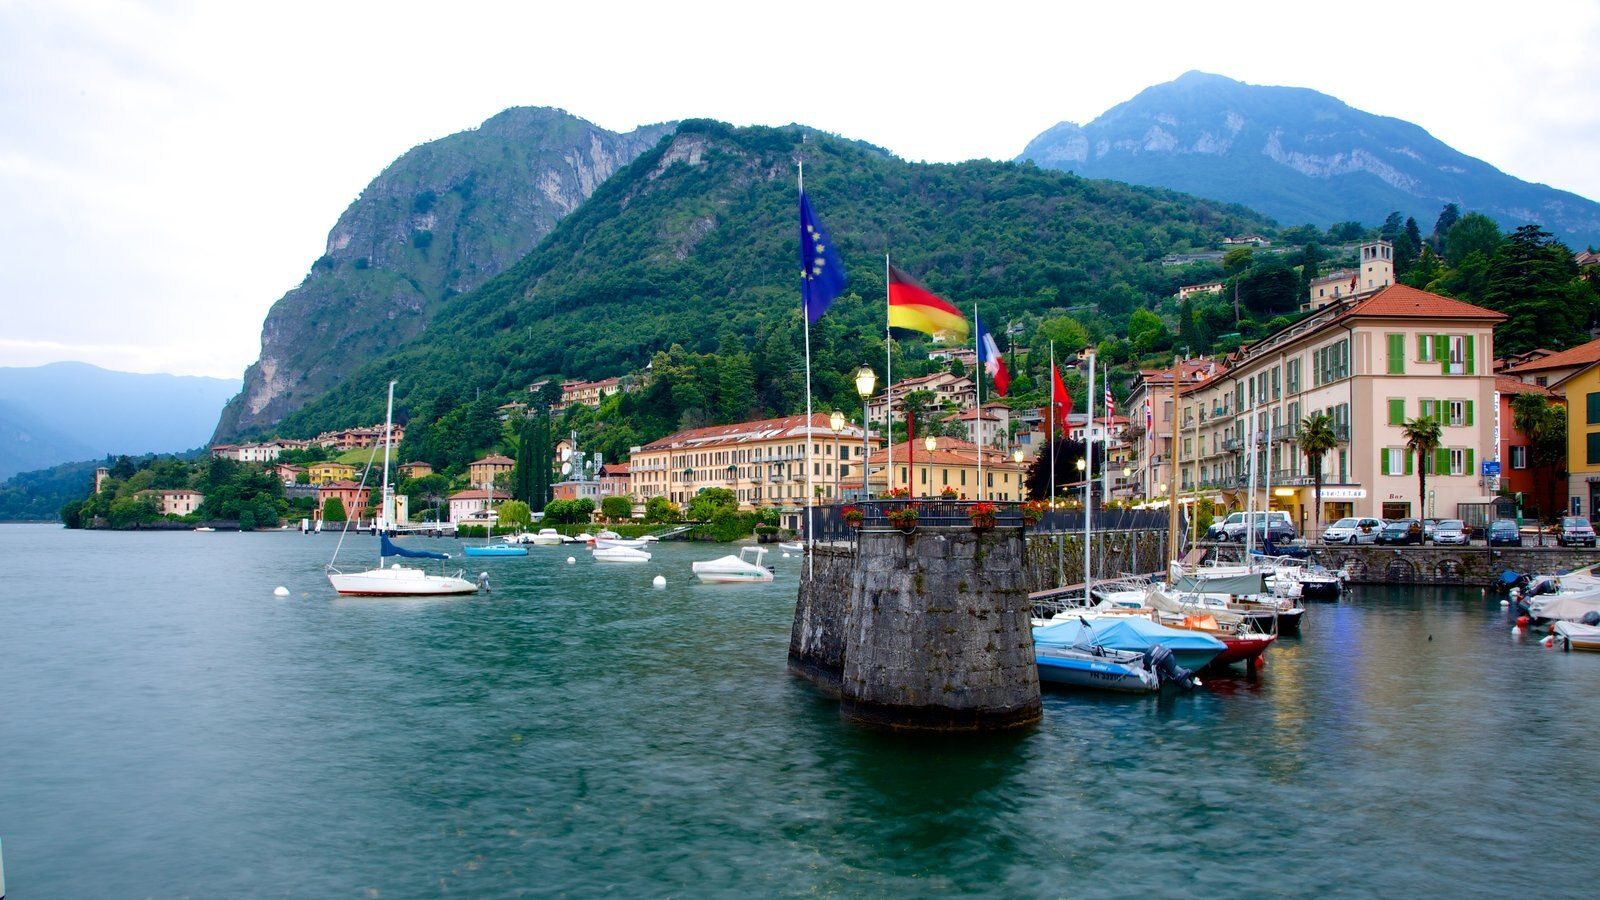 Menaggio which includes a marina, general coastal views and a coastal town